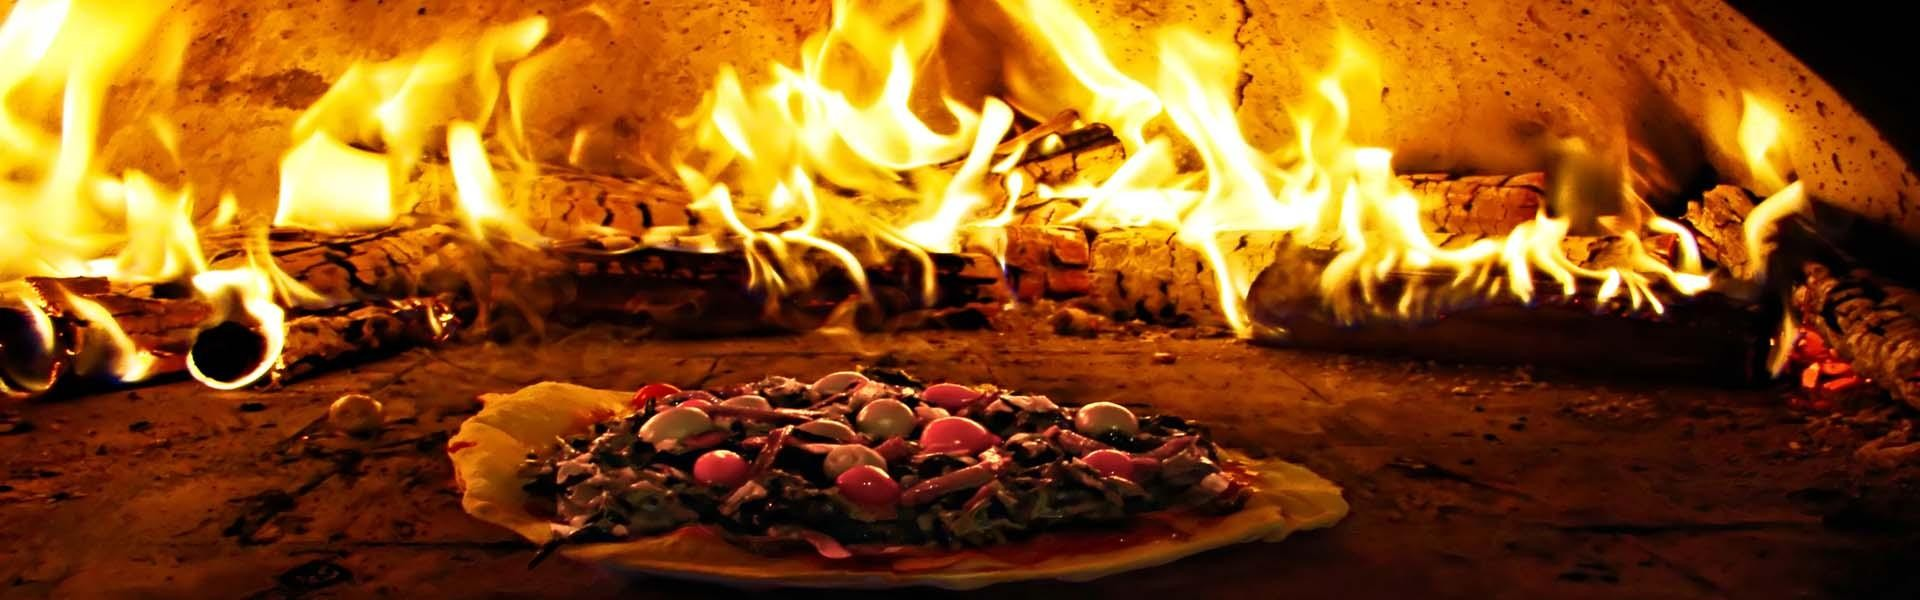 Pizza takeaway - Est 2001, annual net profit: $207K